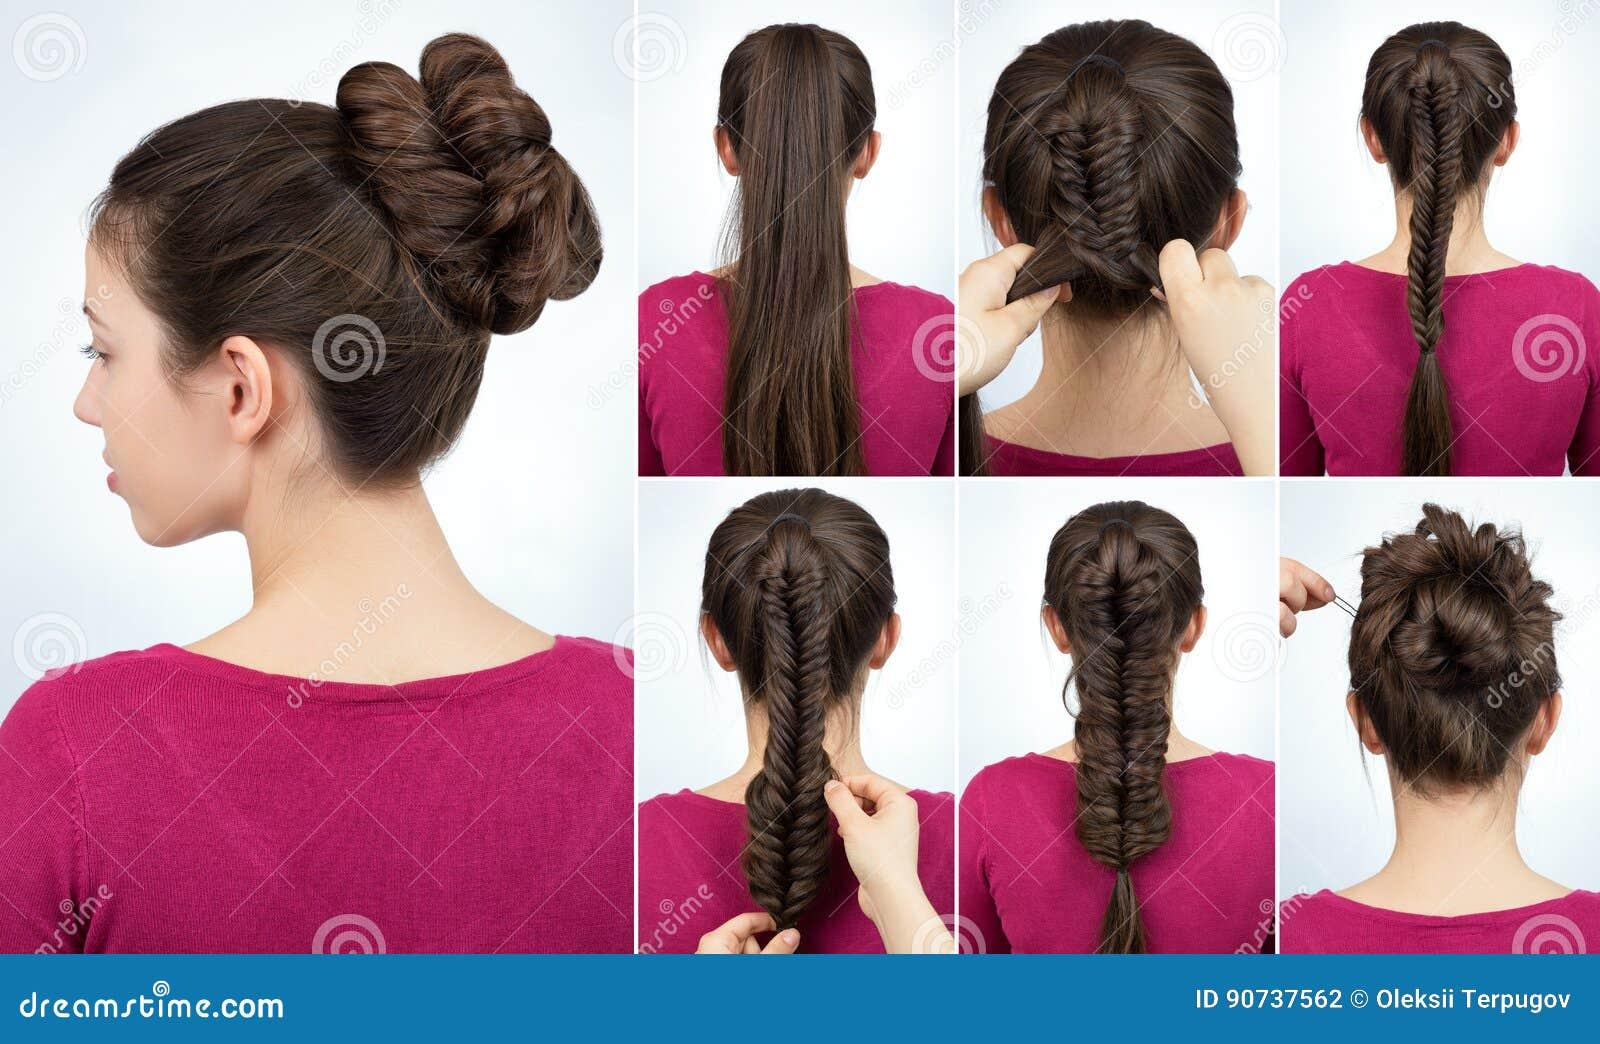 Hairstyle Bun Tutorial Stock Photo Image Of Long Stylist 90737562